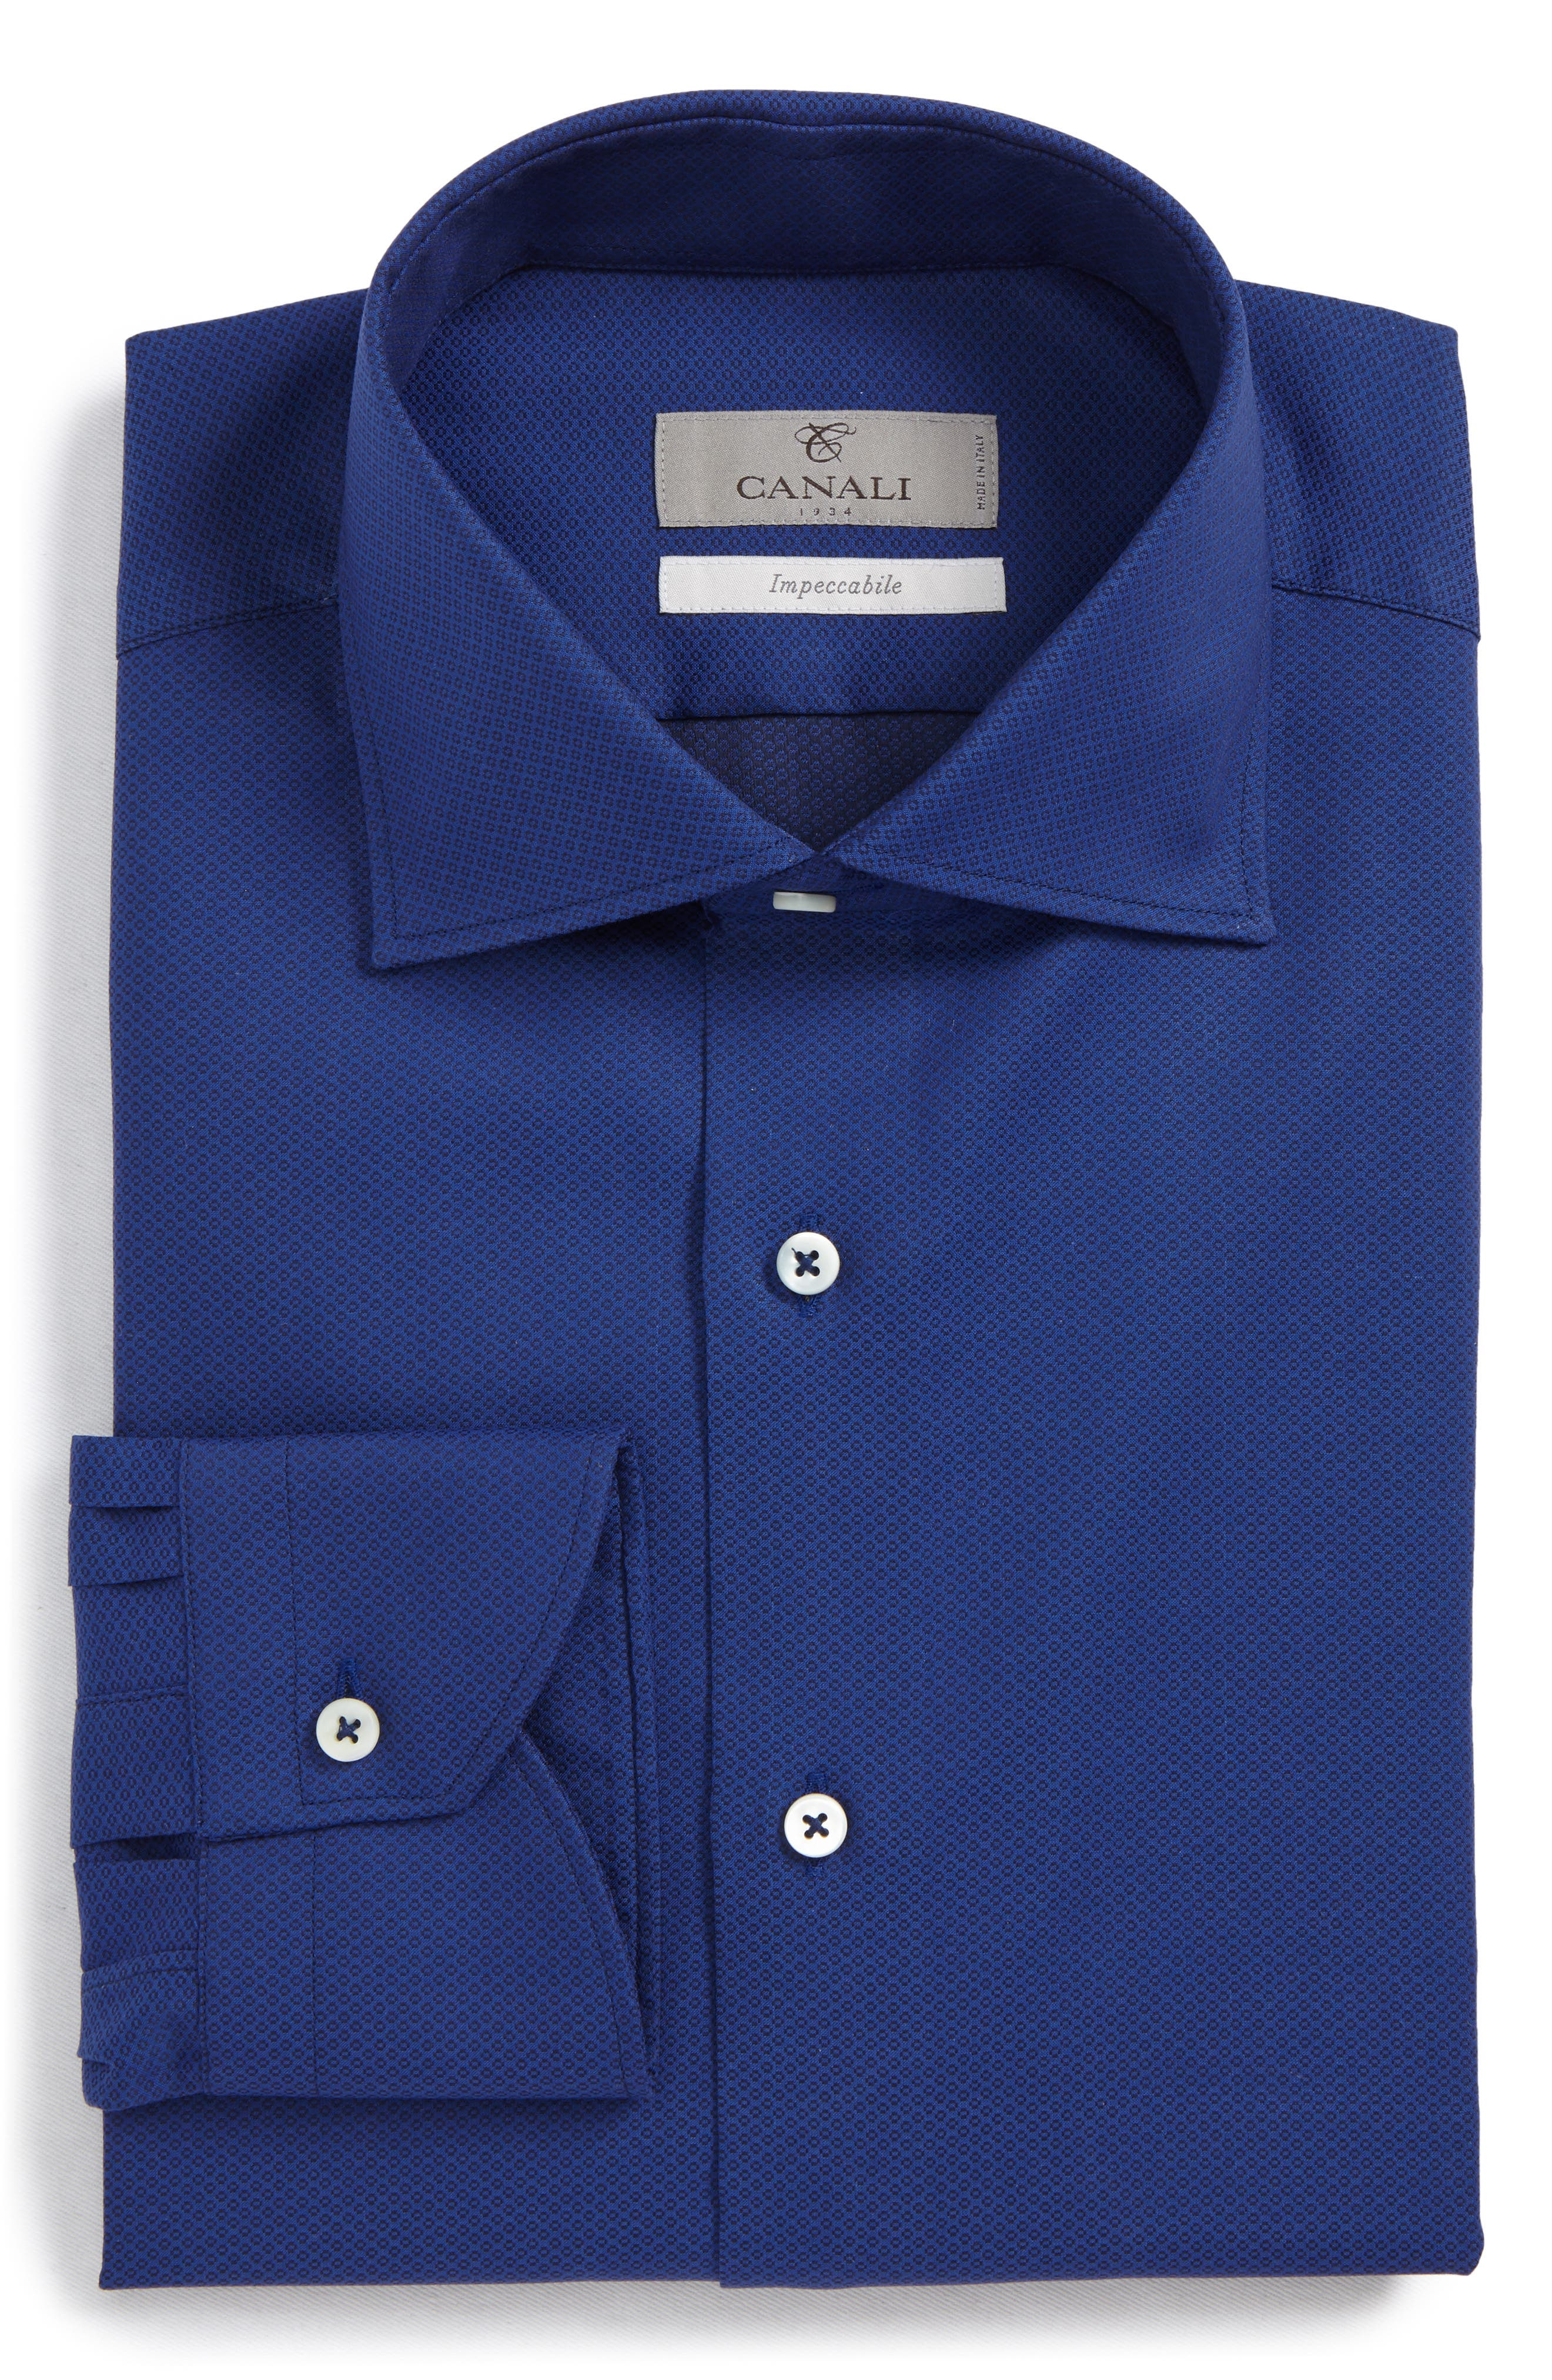 Regular Fit Geometric Dress Shirt,                             Main thumbnail 1, color,                             Dark Blue